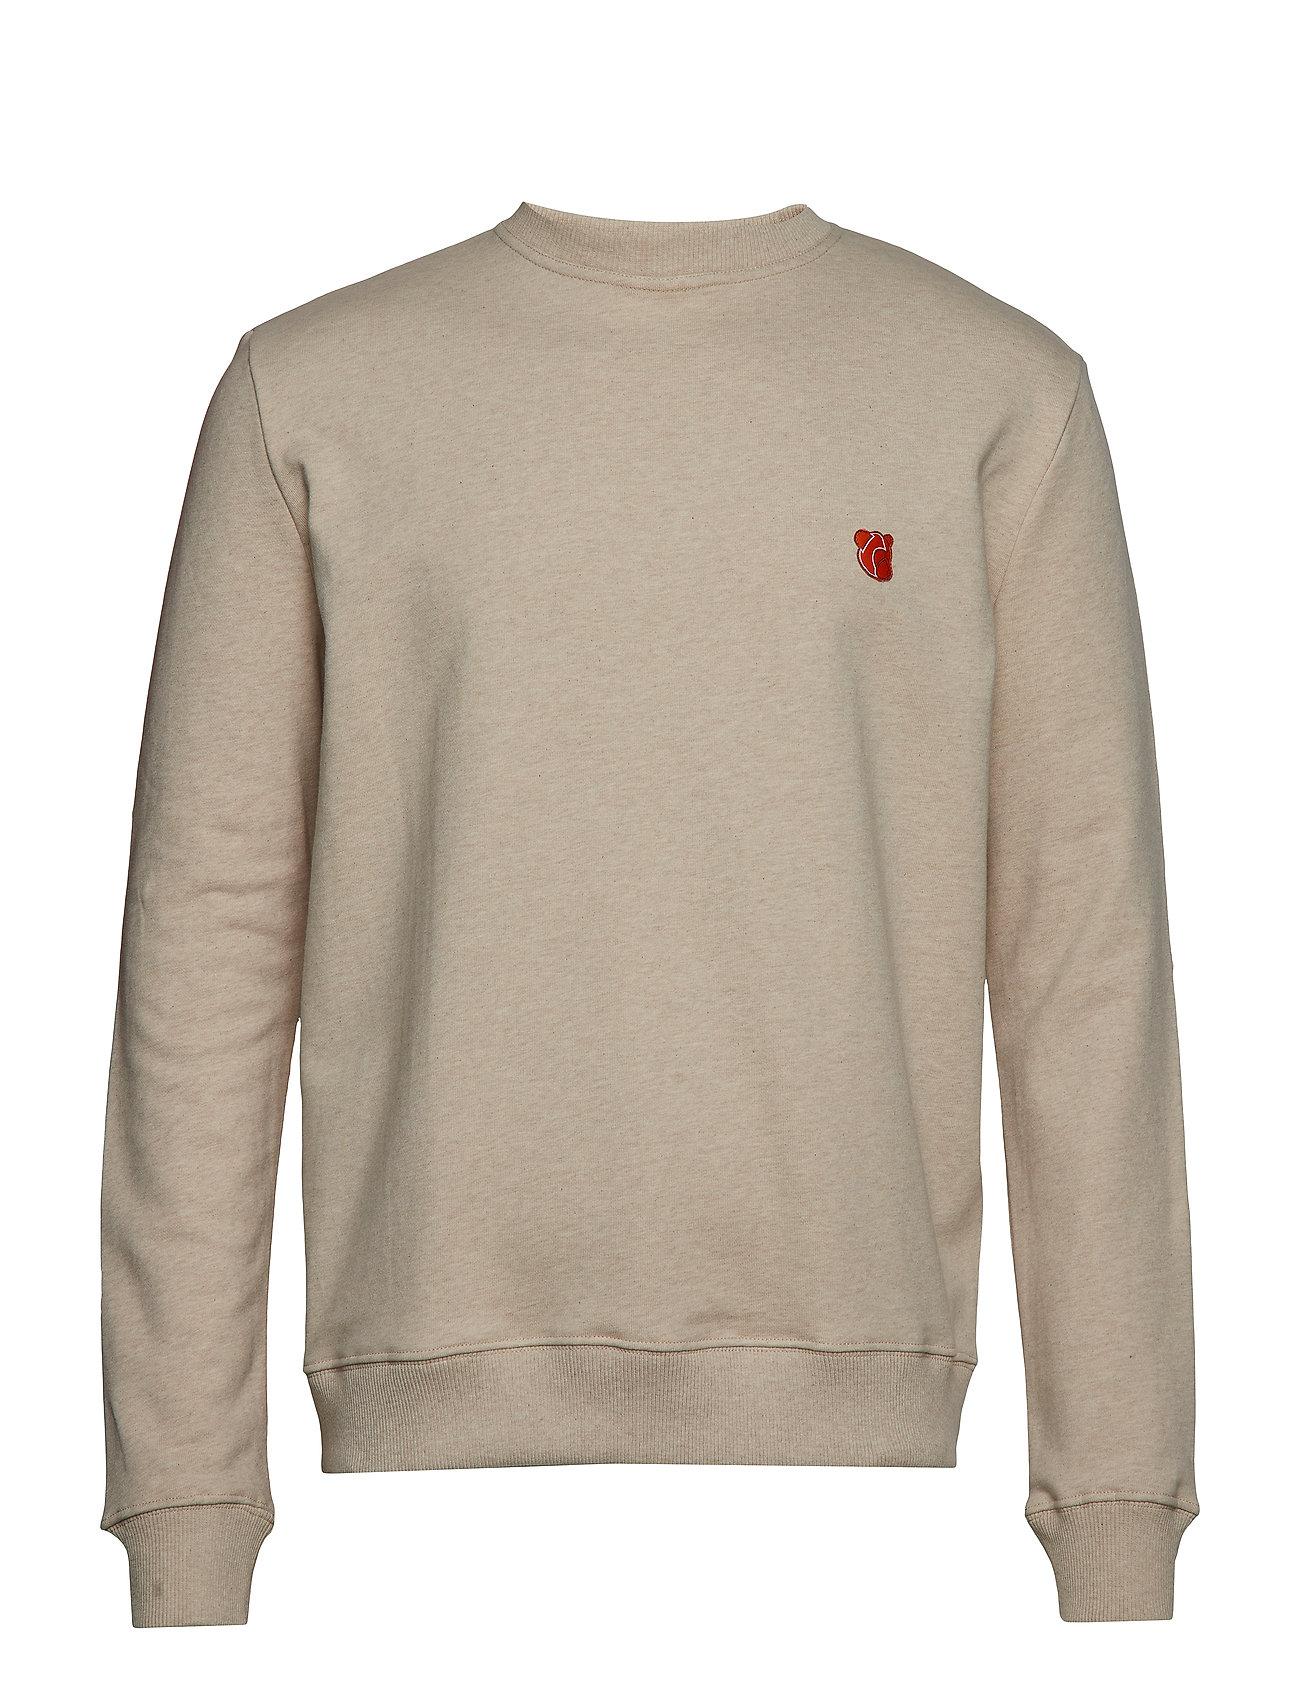 Teddy With MelangeTonsure Embroidered Logobeige Sweatshirt WDbHE2I9eY